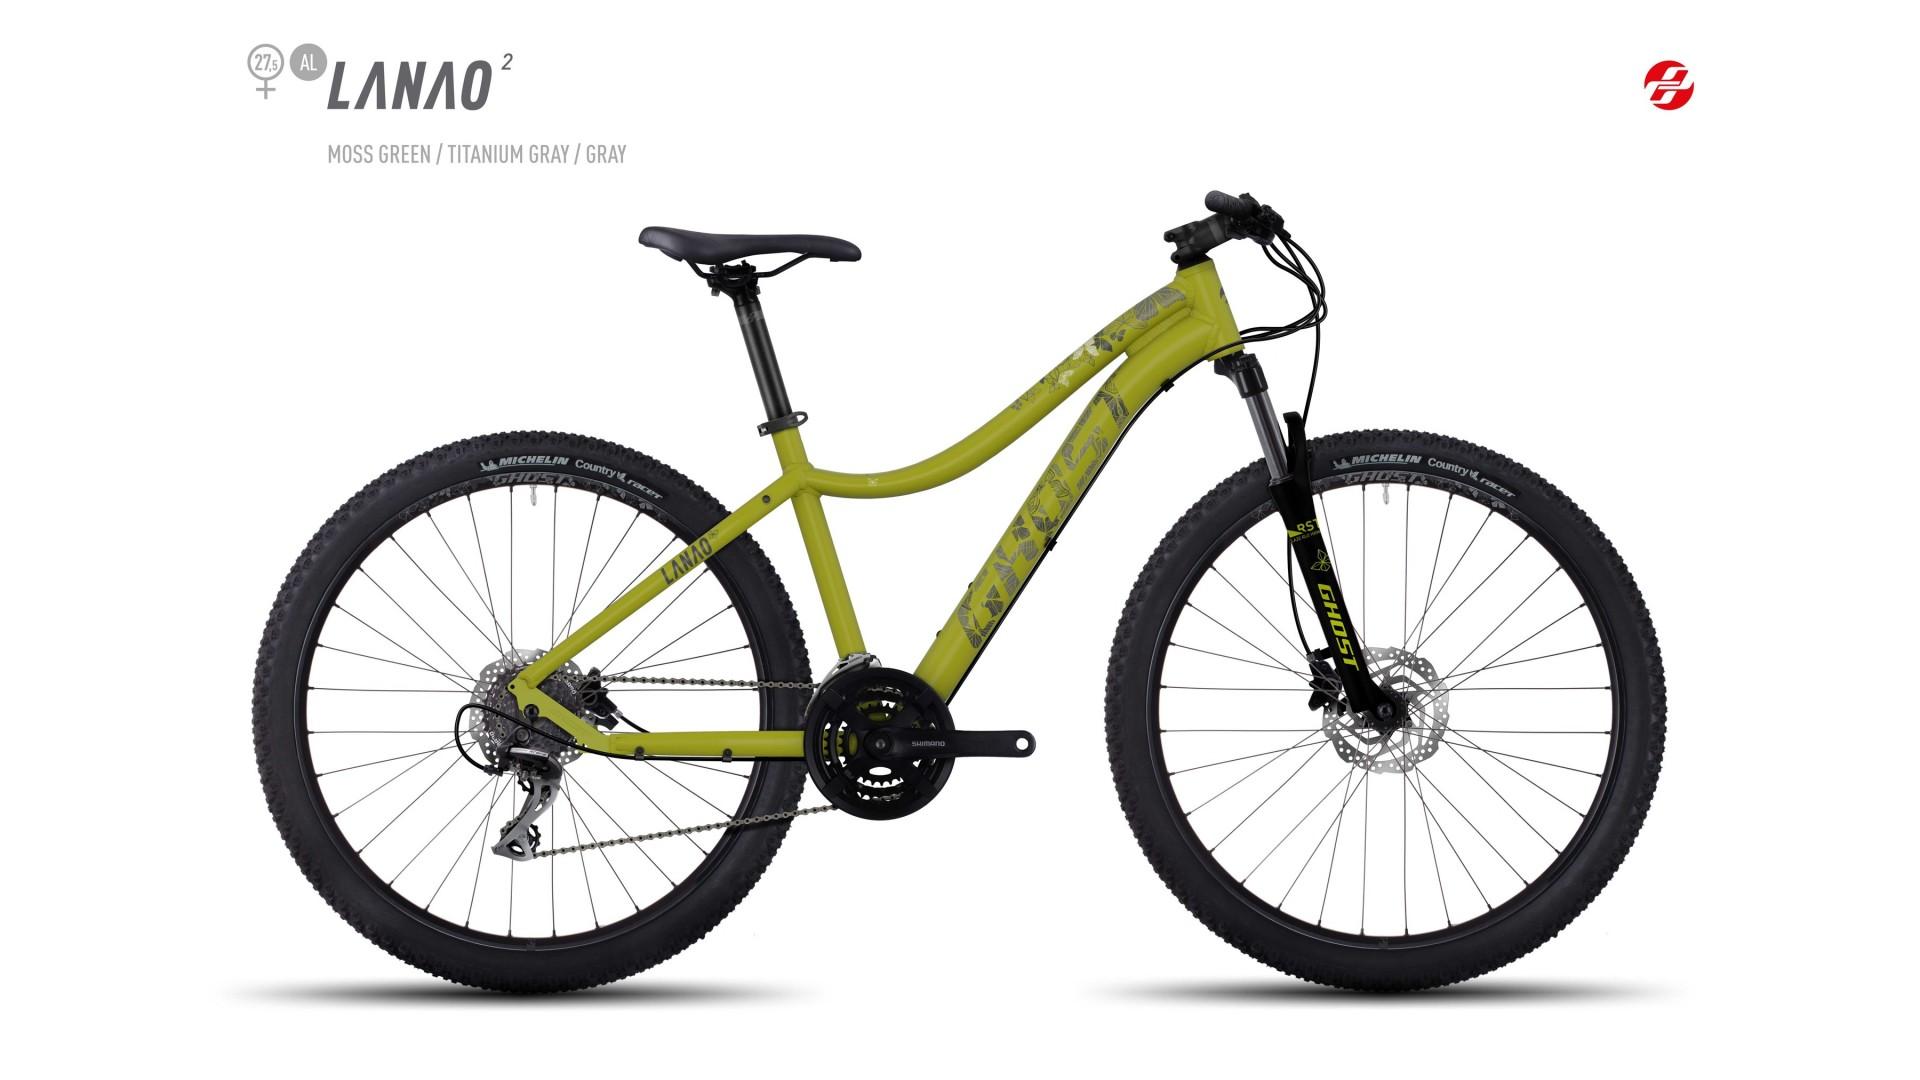 Велосипед GHOST Lanao 2 AL 27.5 mossgreen/titaniumgrey/grey год 2017